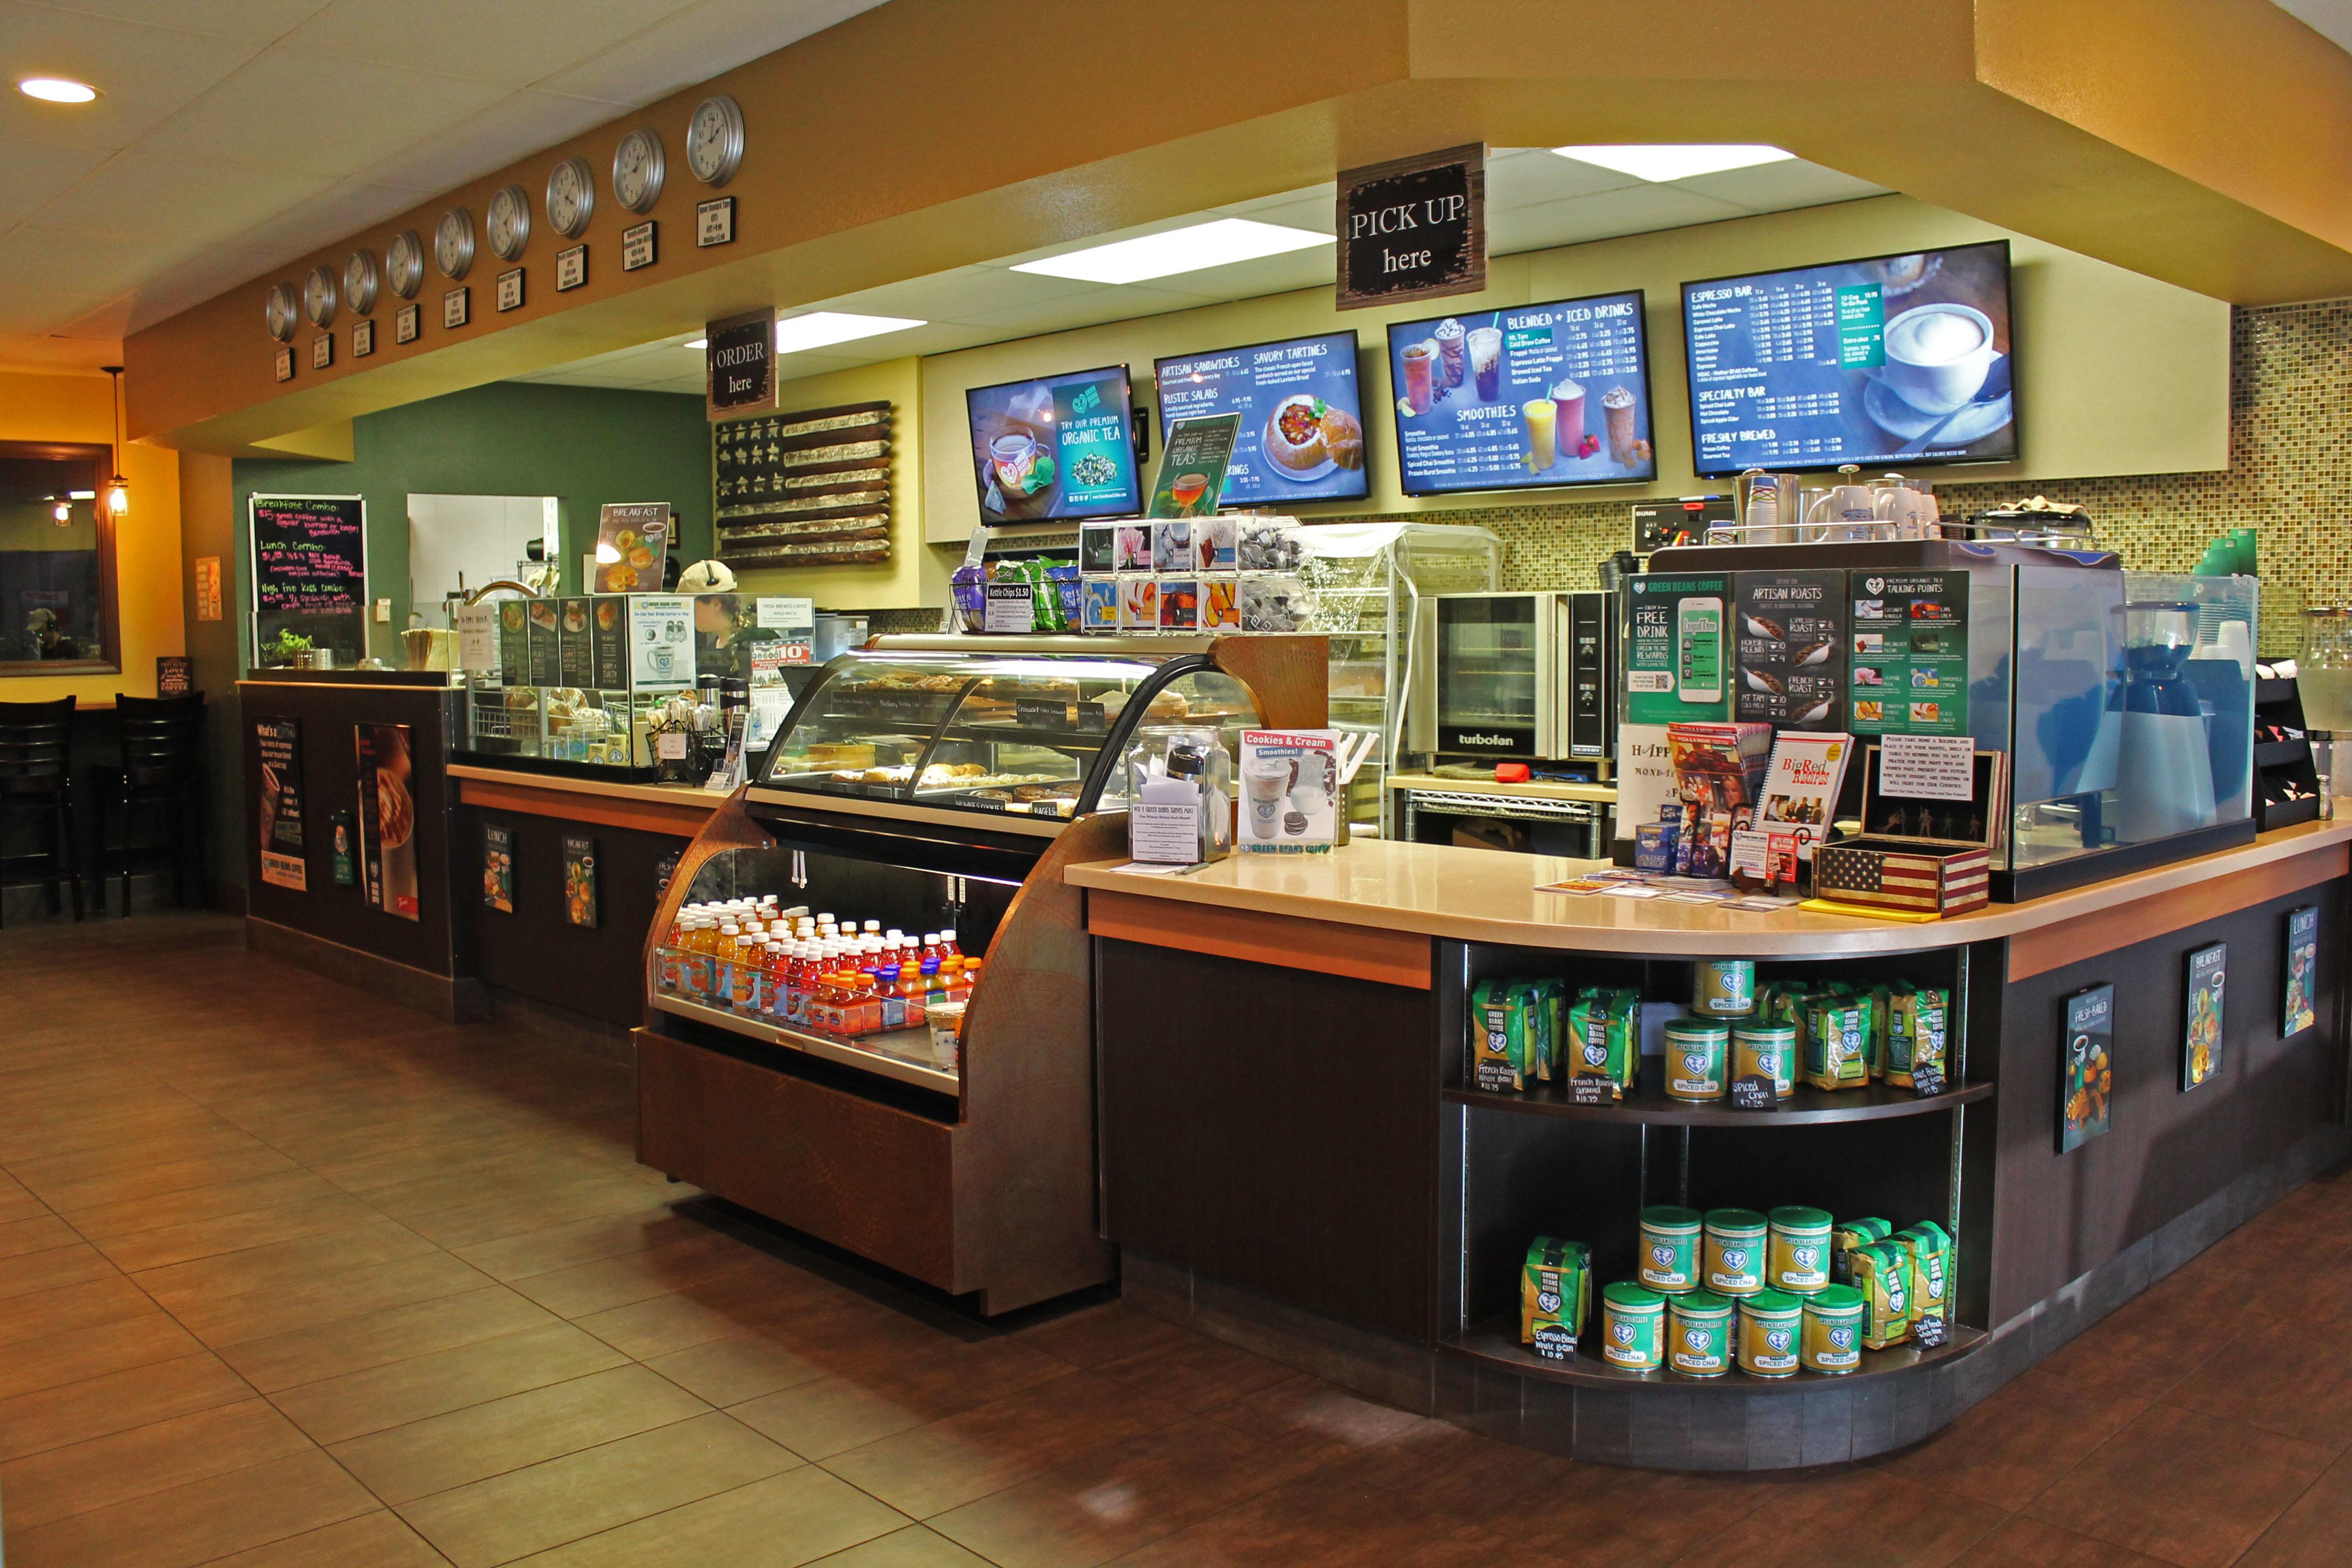 Restaurants That Serve Breakfast Omaha Ne